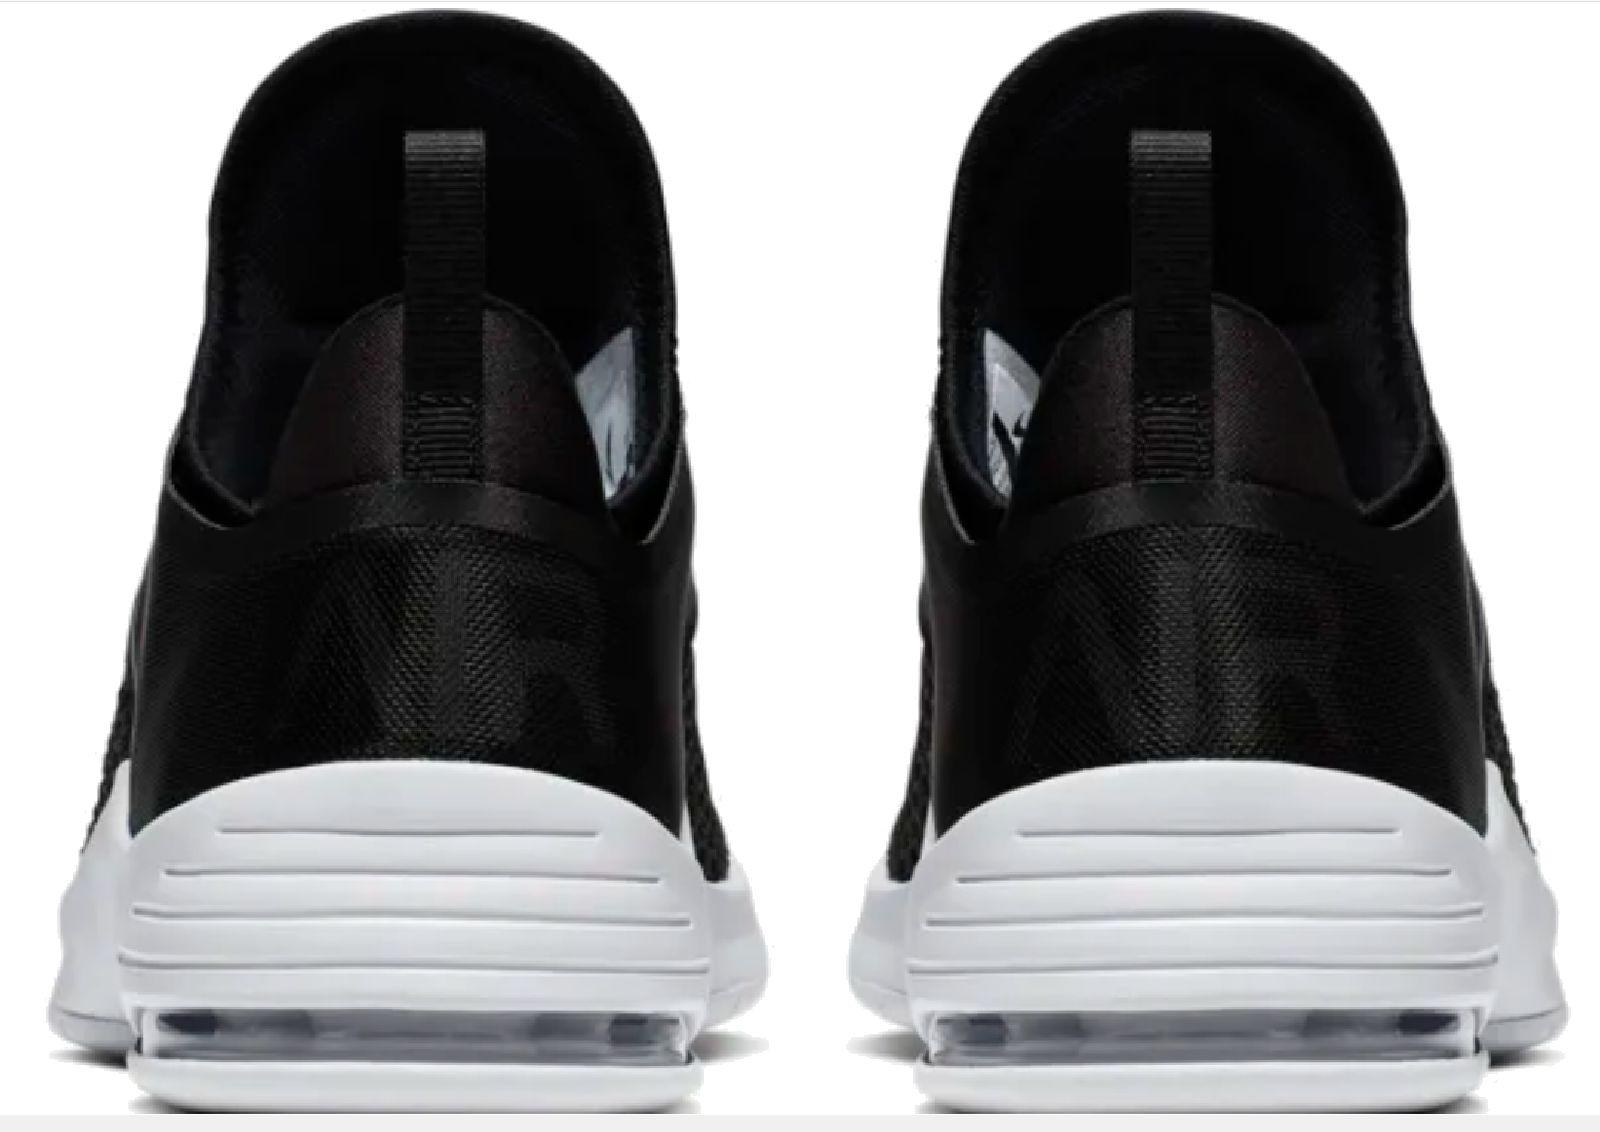 Wmns Bella 2 Fitness Schuhe Tr Nike Black Sport about Max Trainings Nike Air Details Ladies 4LR5Aj